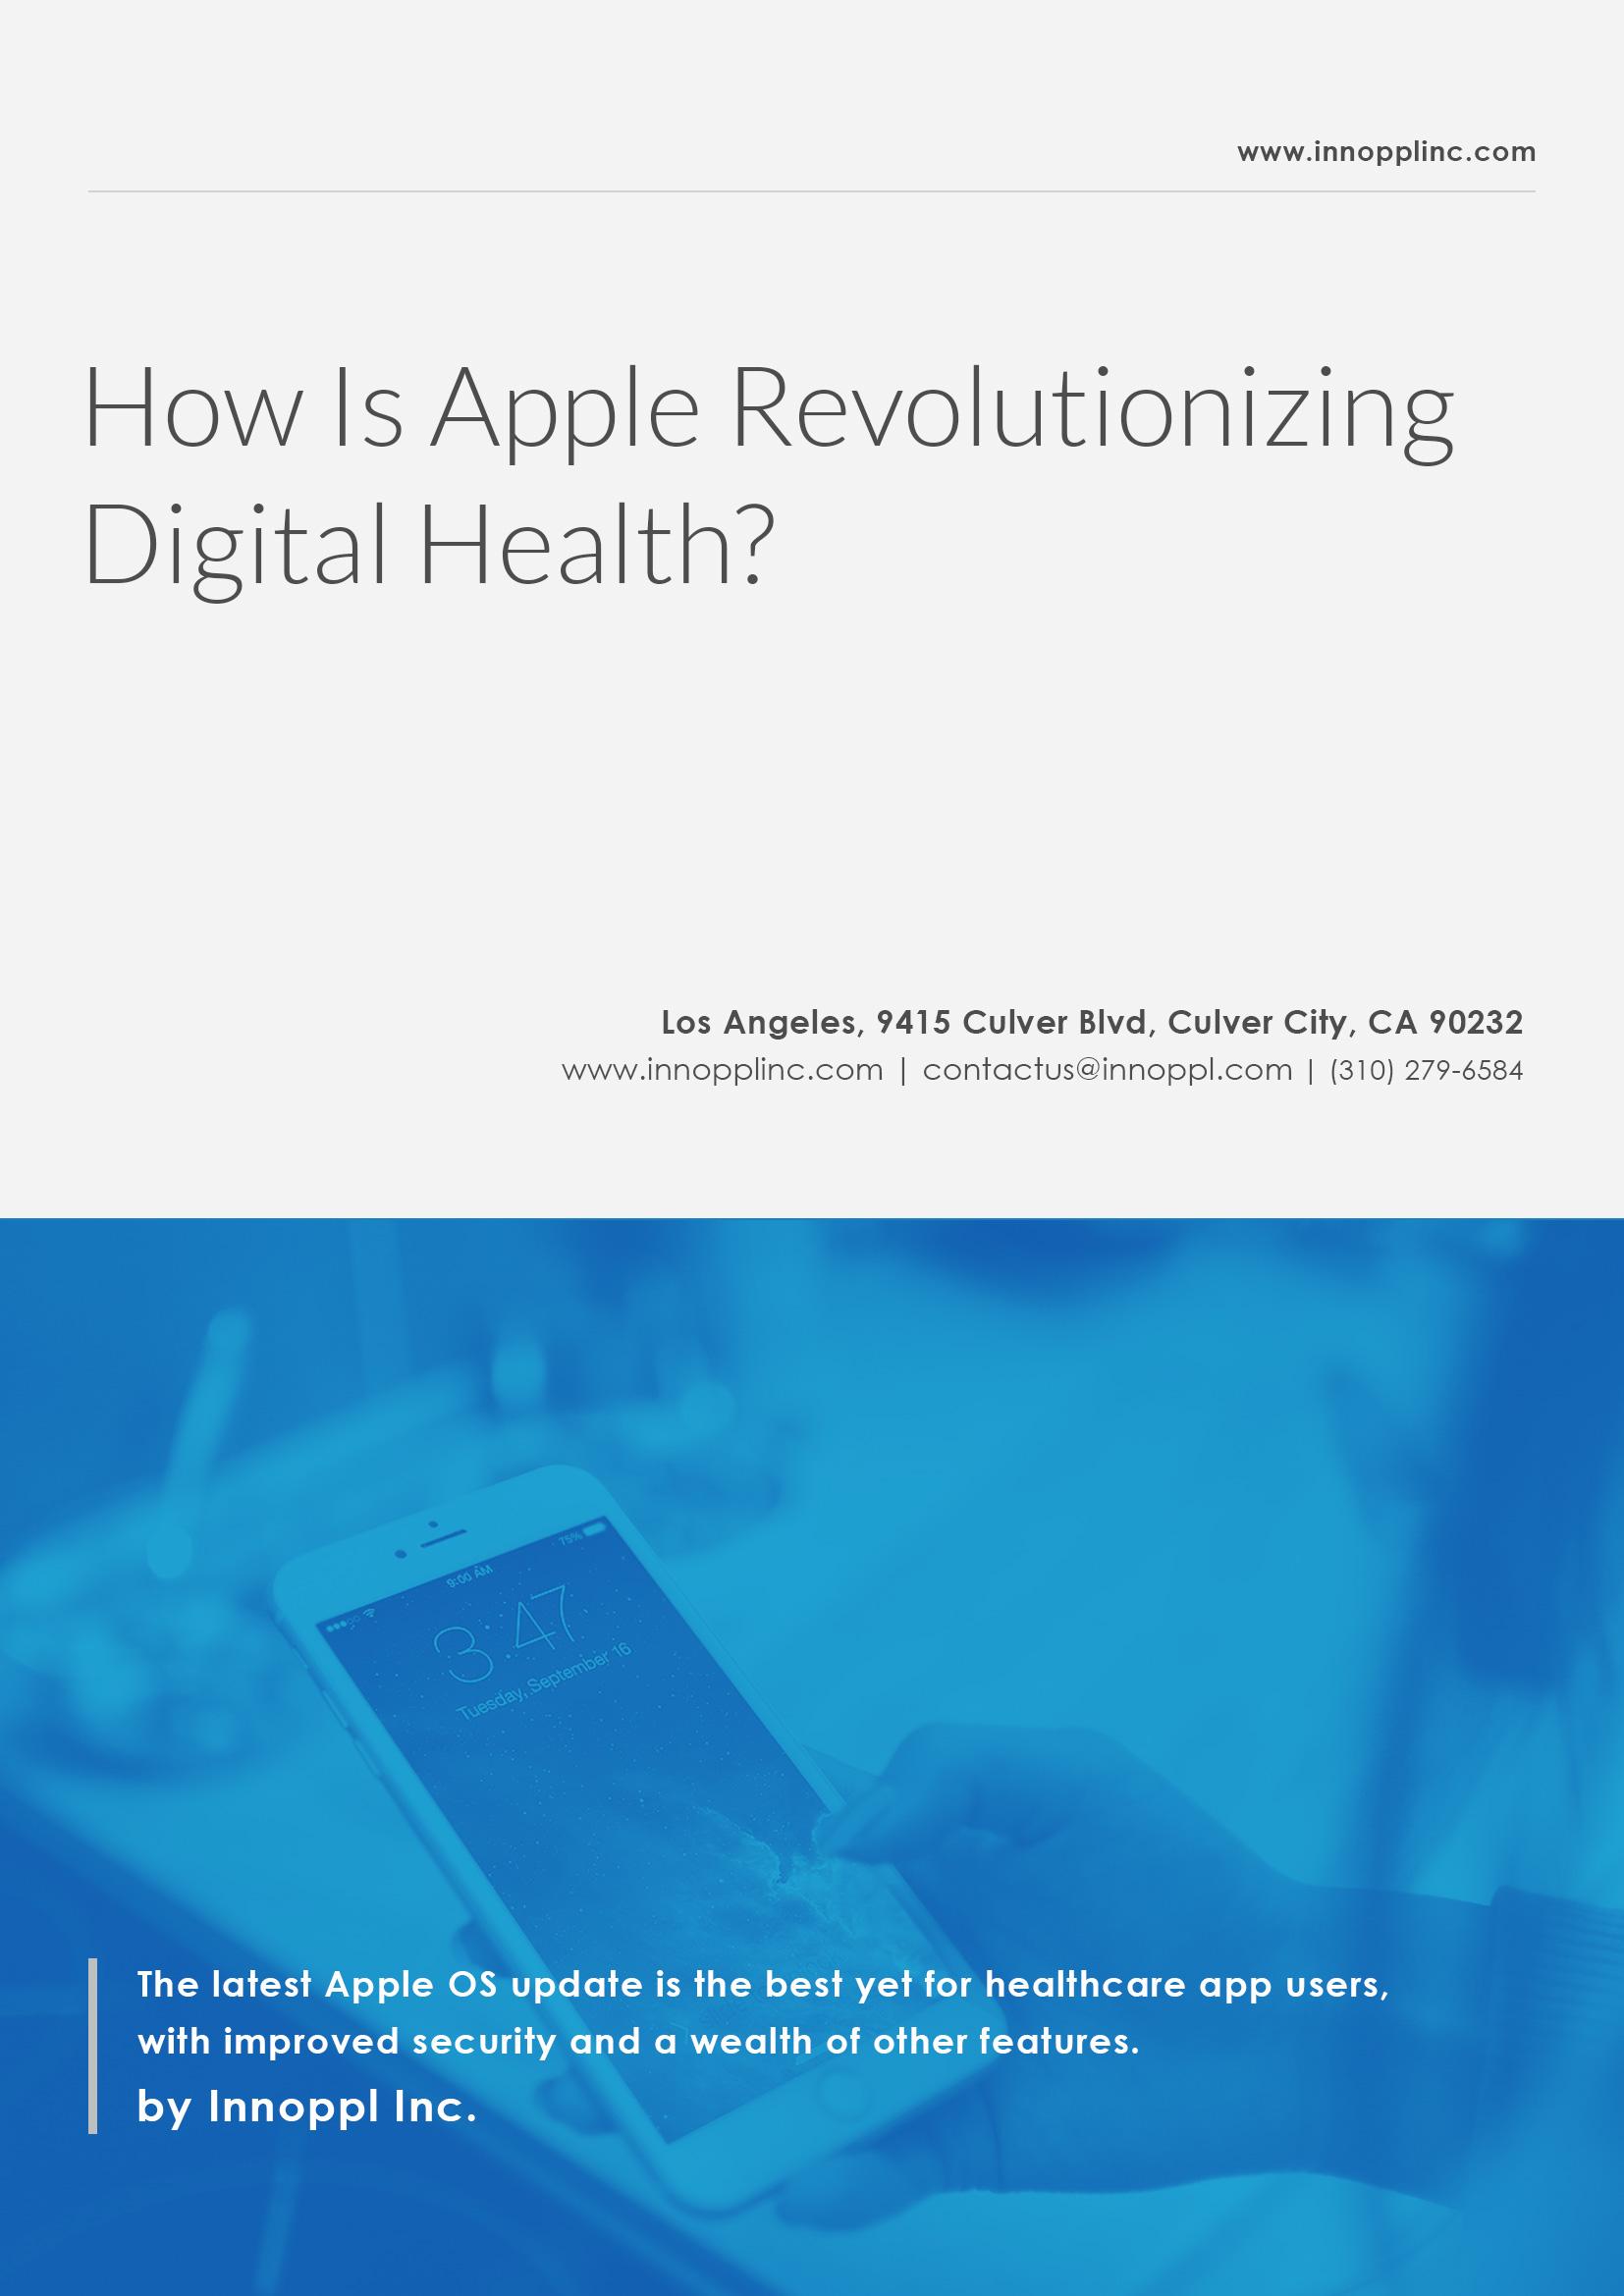 How Is Apple Revolutionizing Digital Health